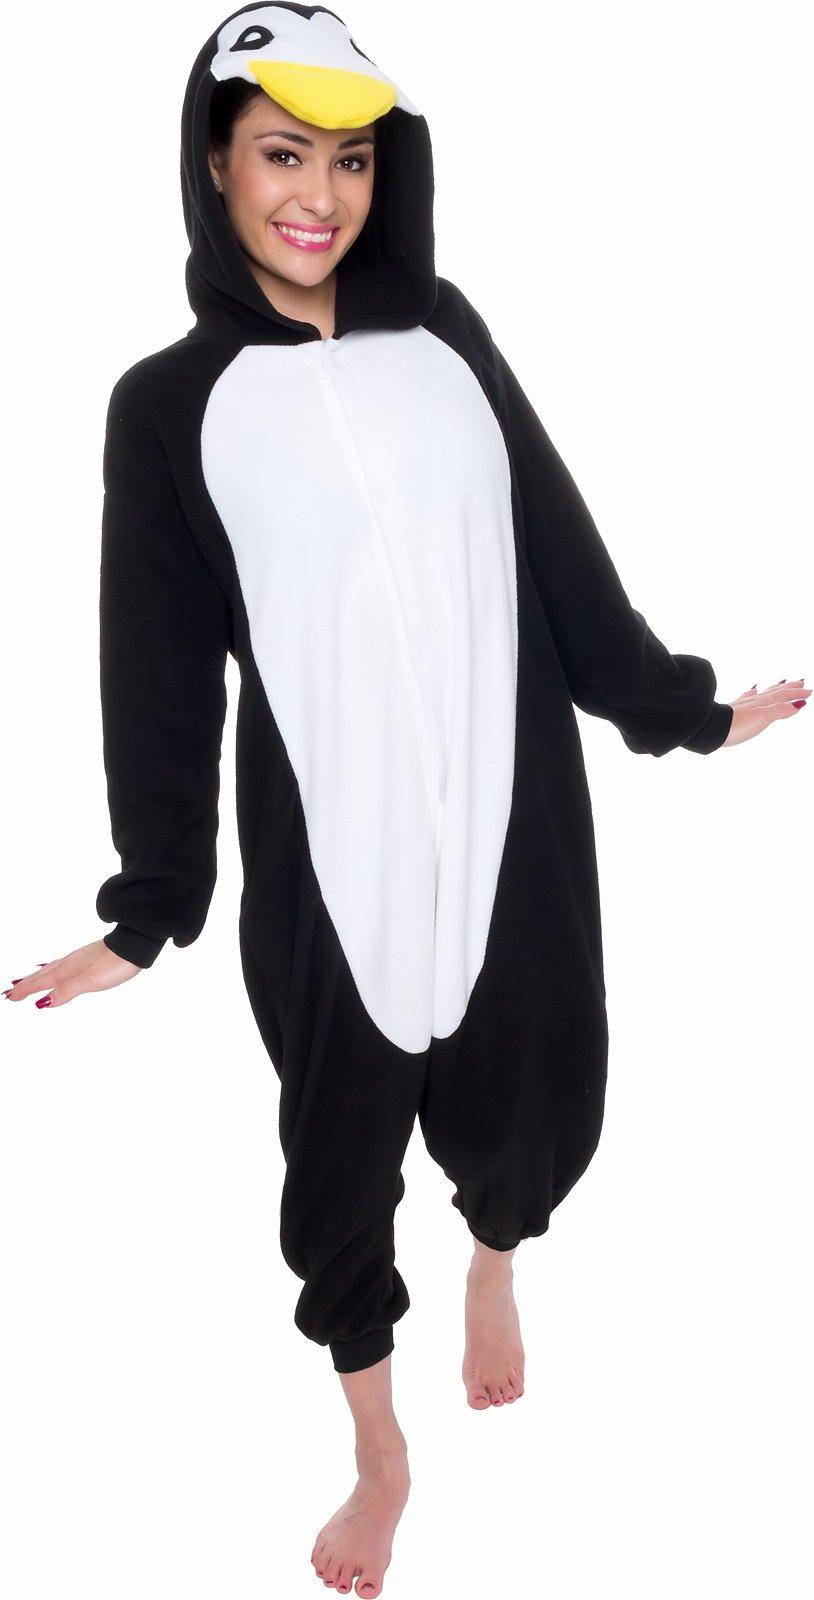 Silver Lilly Unisex Adult Pajamas - Plush One Piece Cosplay Penguin Animal Costume